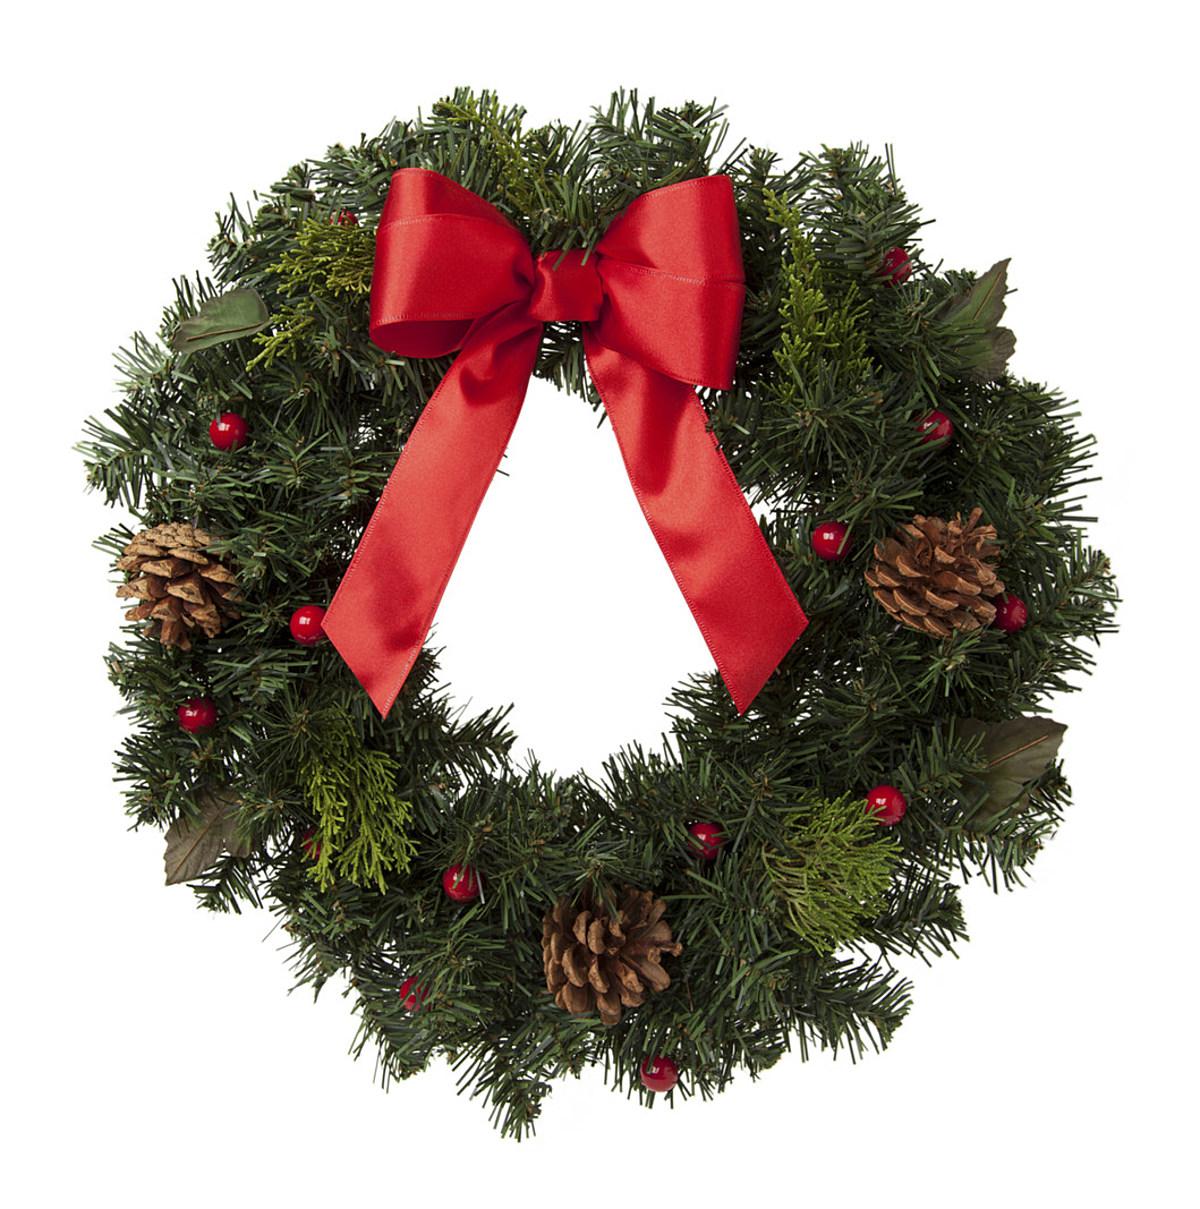 Pleasant Grove Hawks wreath